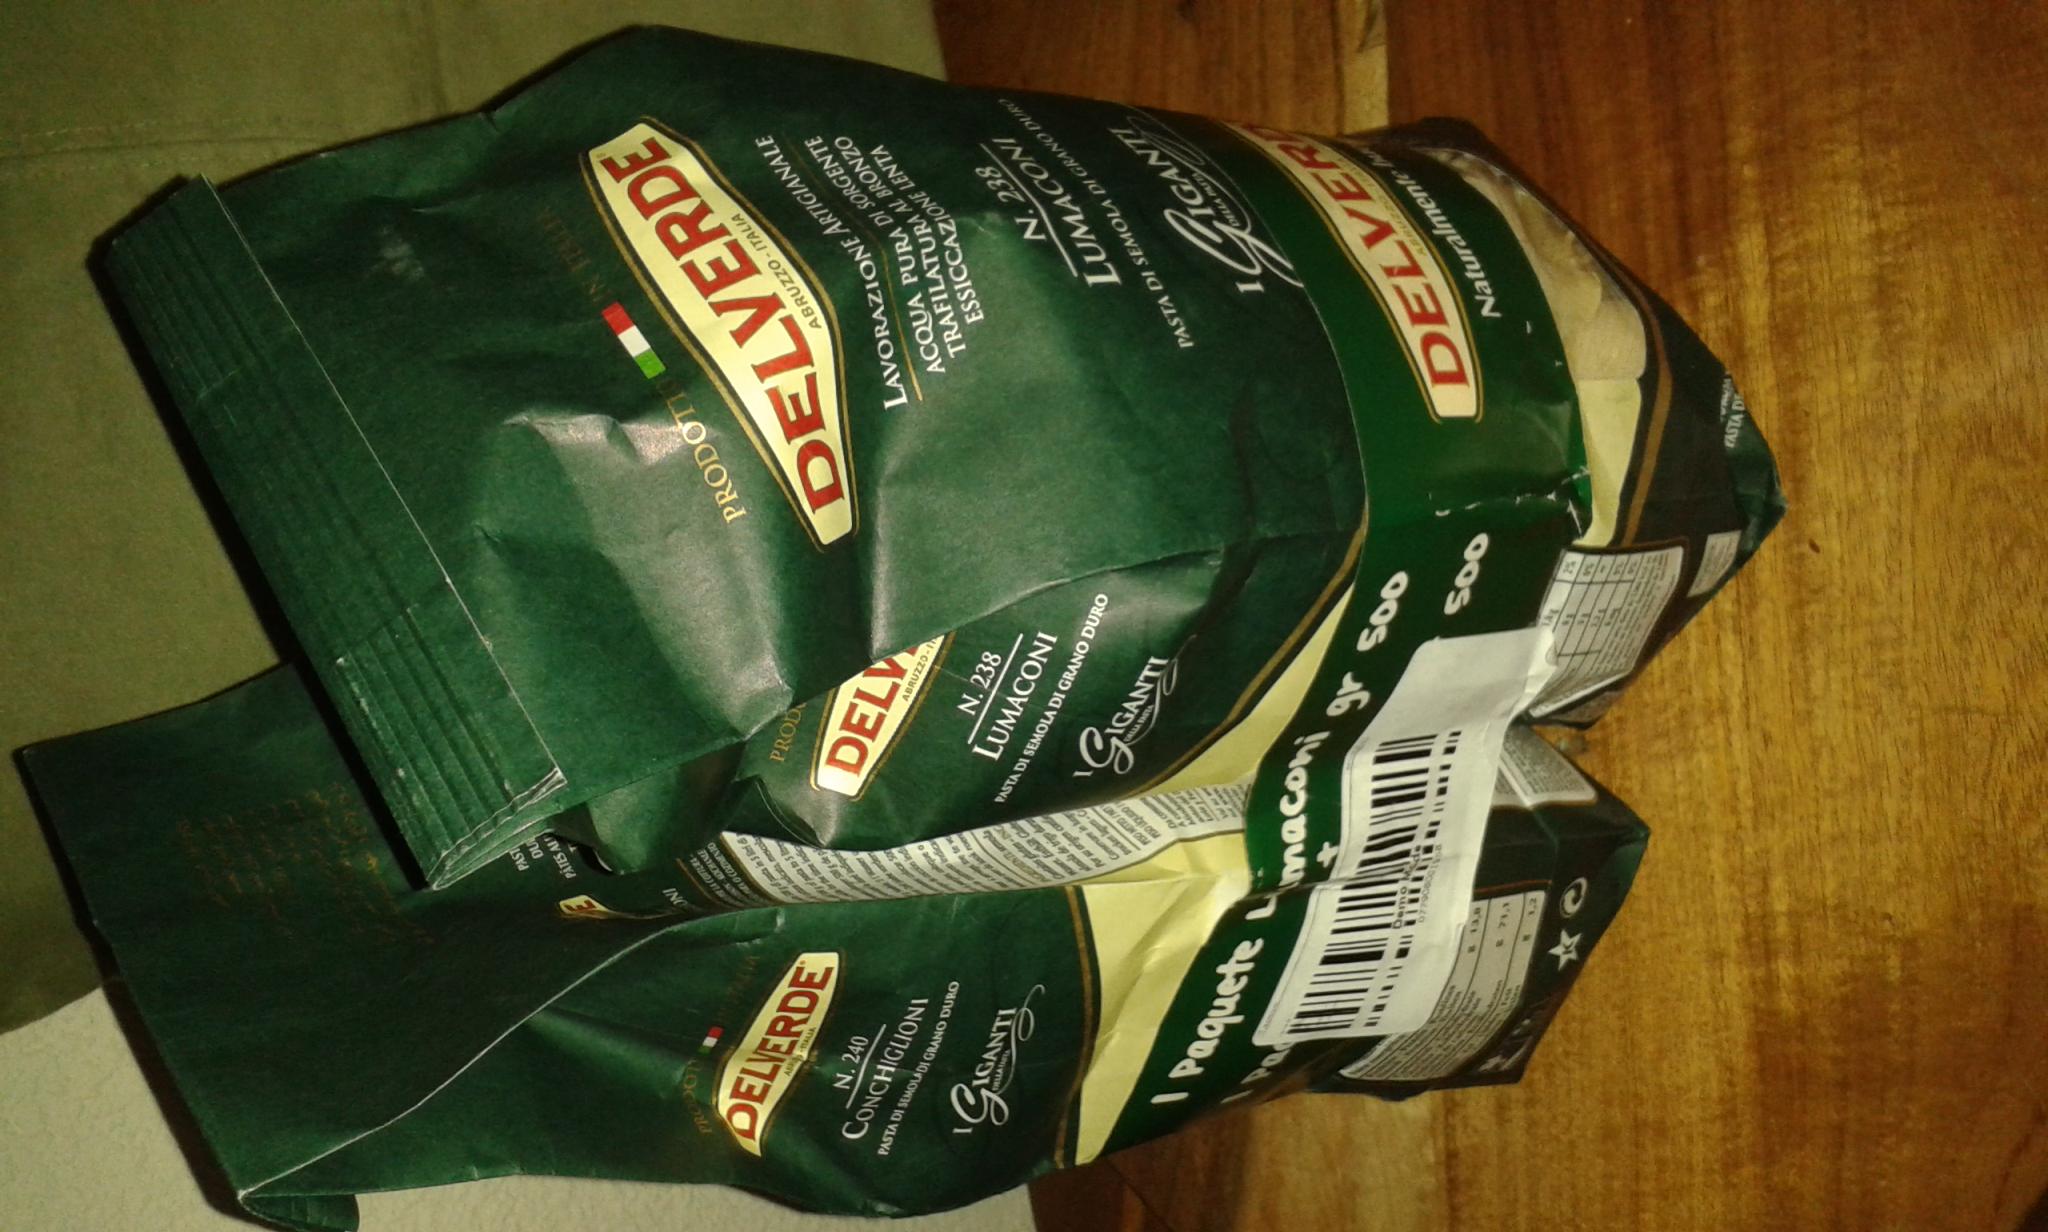 Walmart: Paquete de Pasta Conchiglioni Del Verde 2 Bolsas de 500gr de 49.70 a 15.01